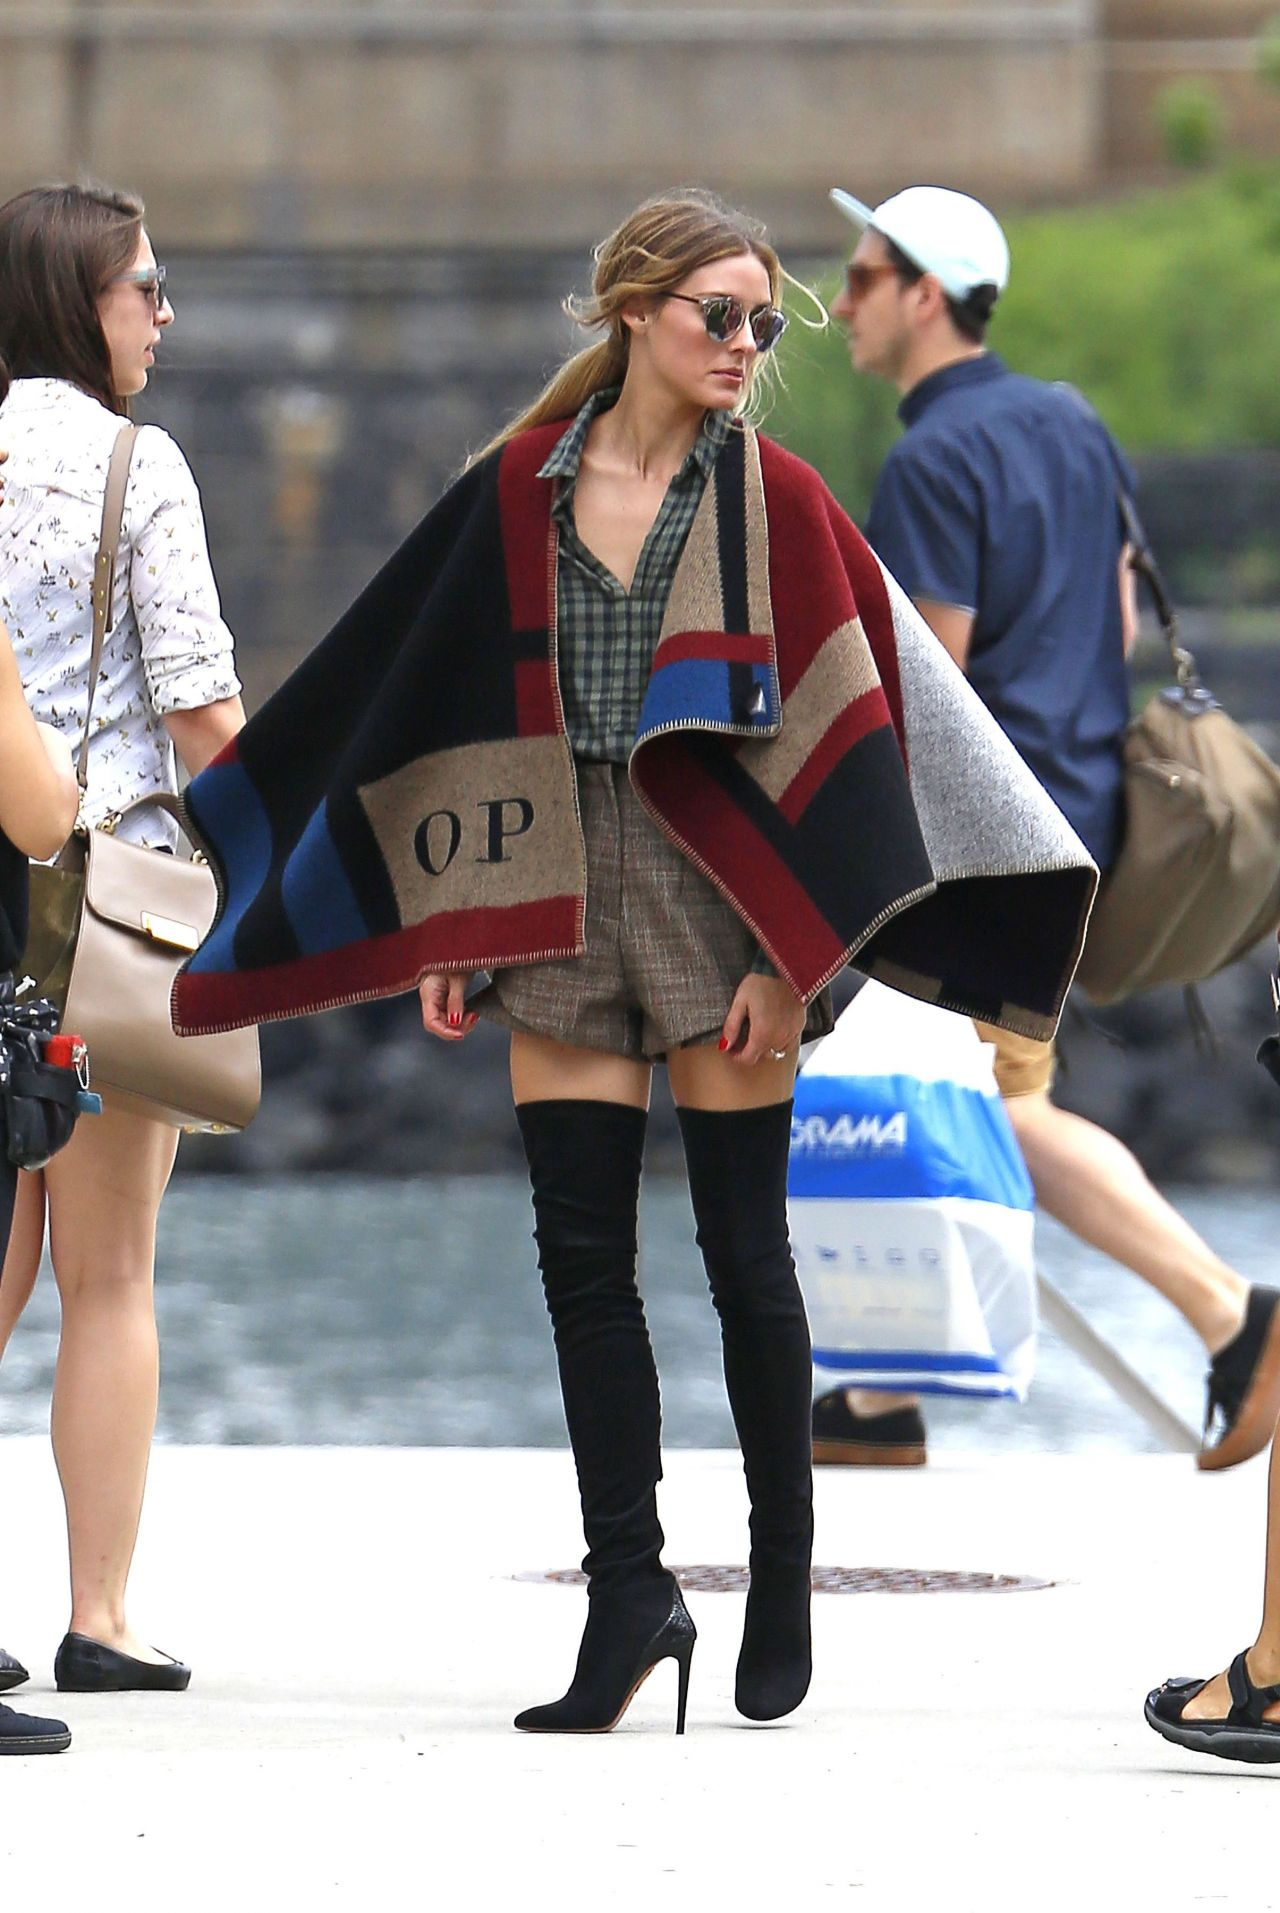 Olivia Palermo Photoshoot in New York City, July 2014 ...